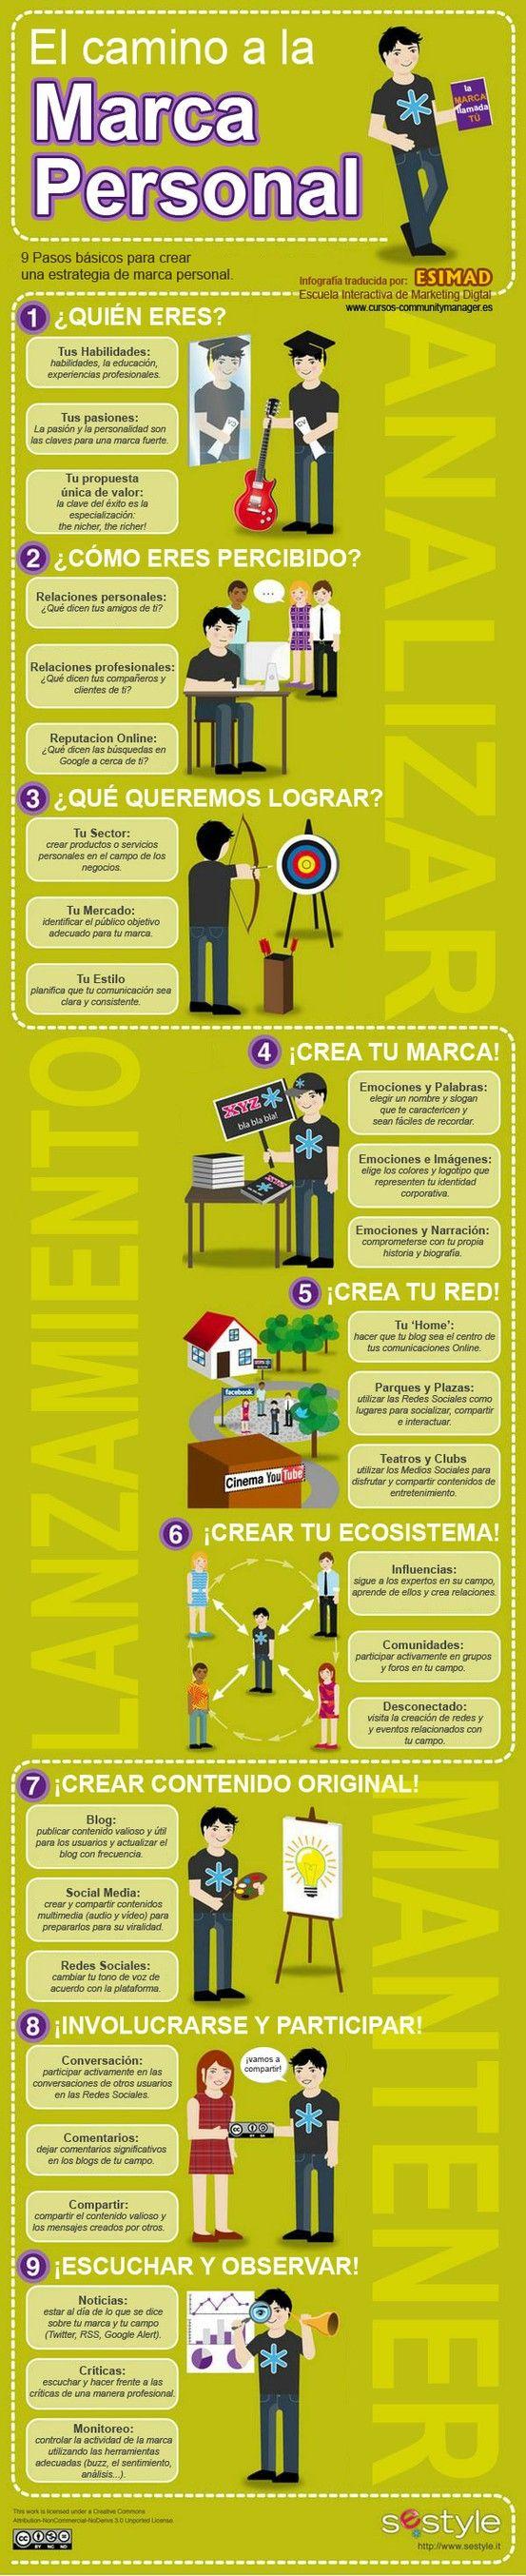 9 pasos para crear tu marca personal | Infografías de Marketing